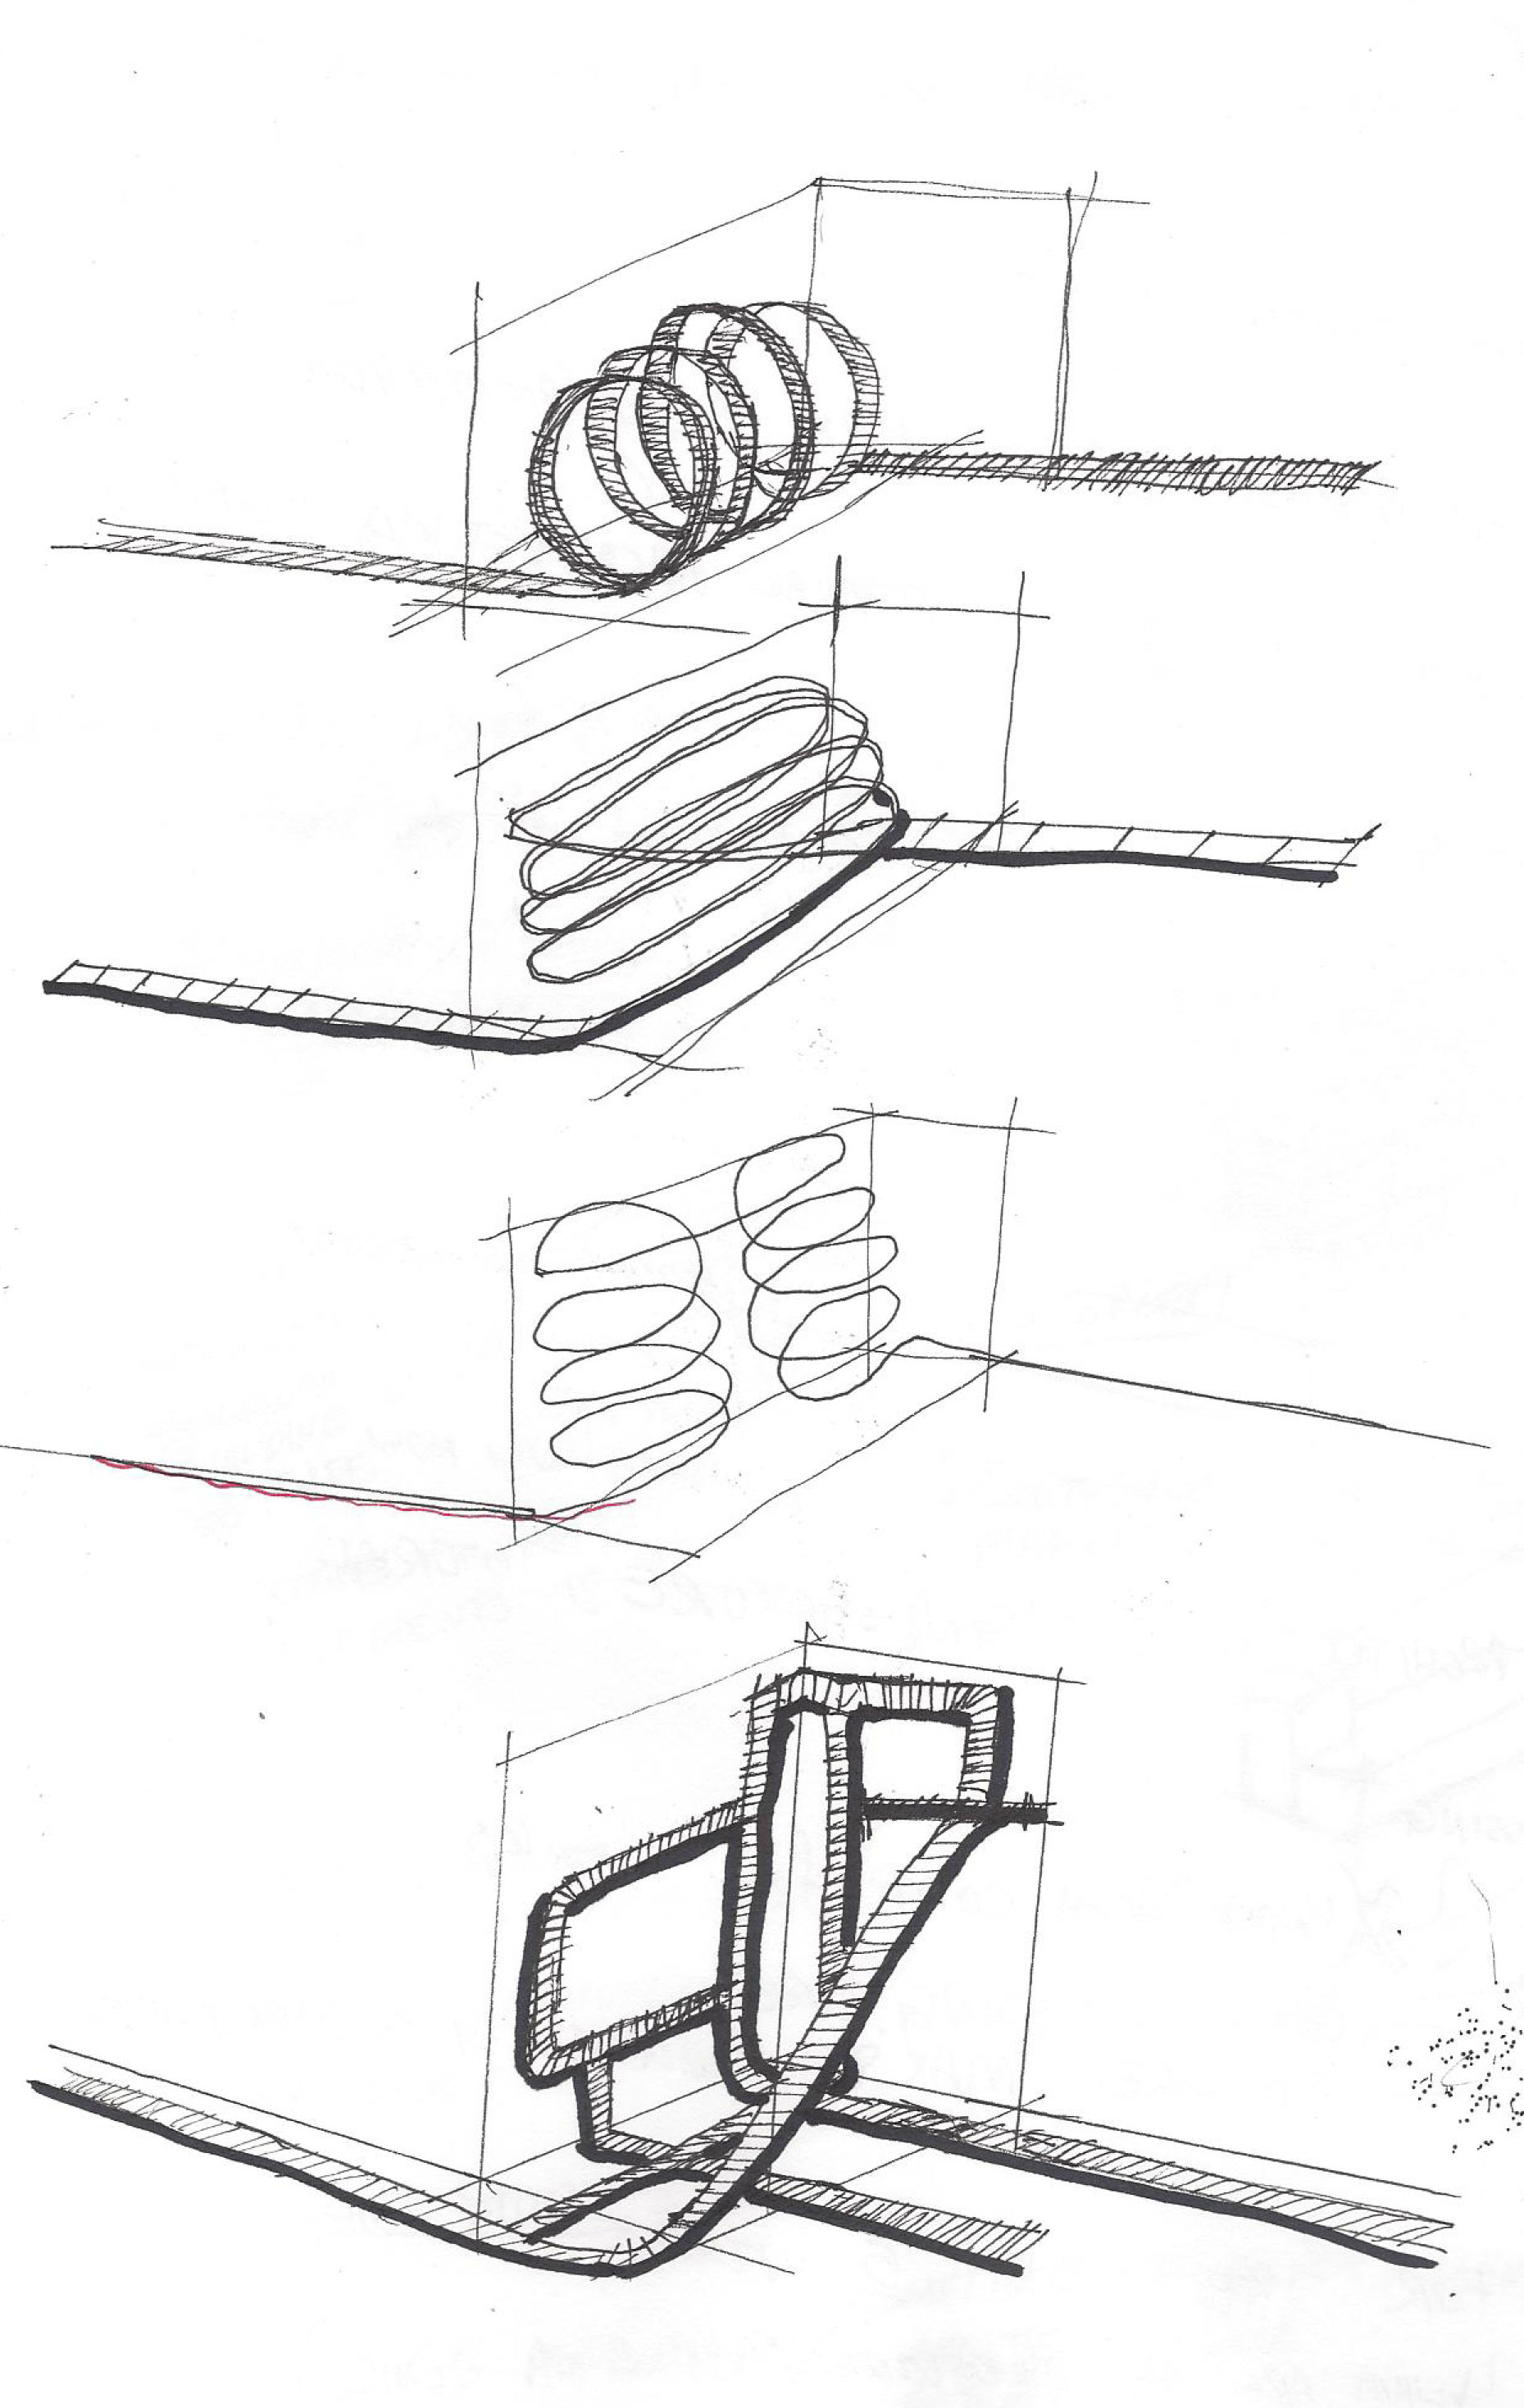 Week 10: Circulation & narrative architecture (design